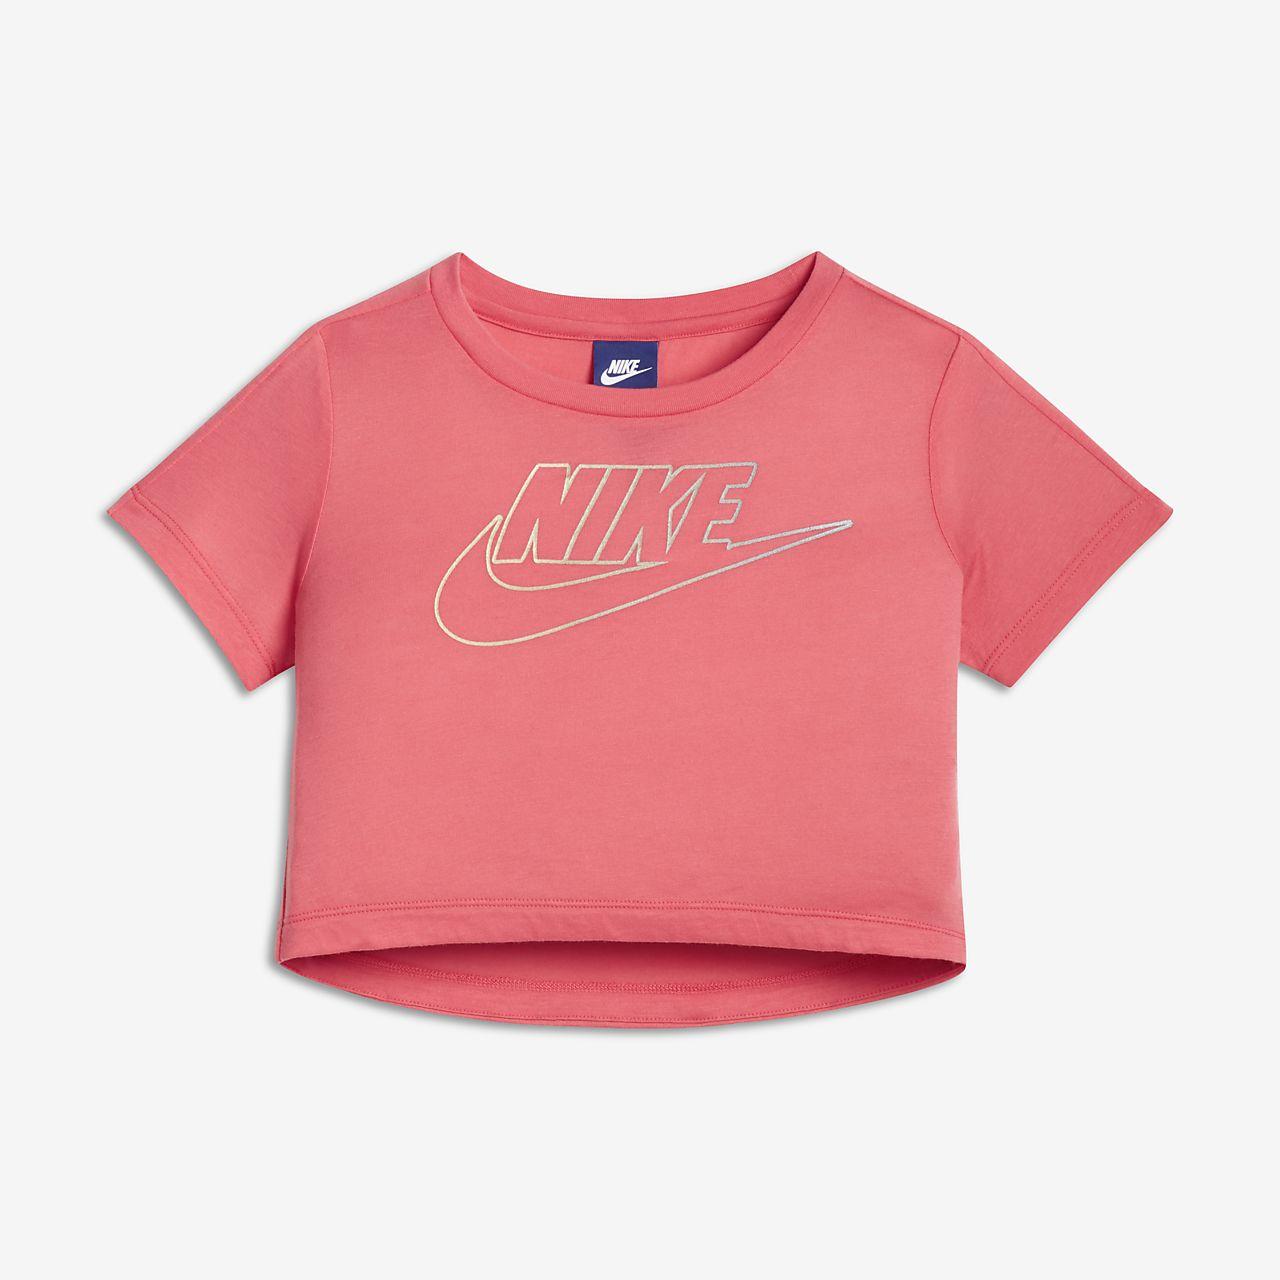 Camiseta de manga corta para niñas talla grande Nike Sportswear ... c2fa8eebb41f4